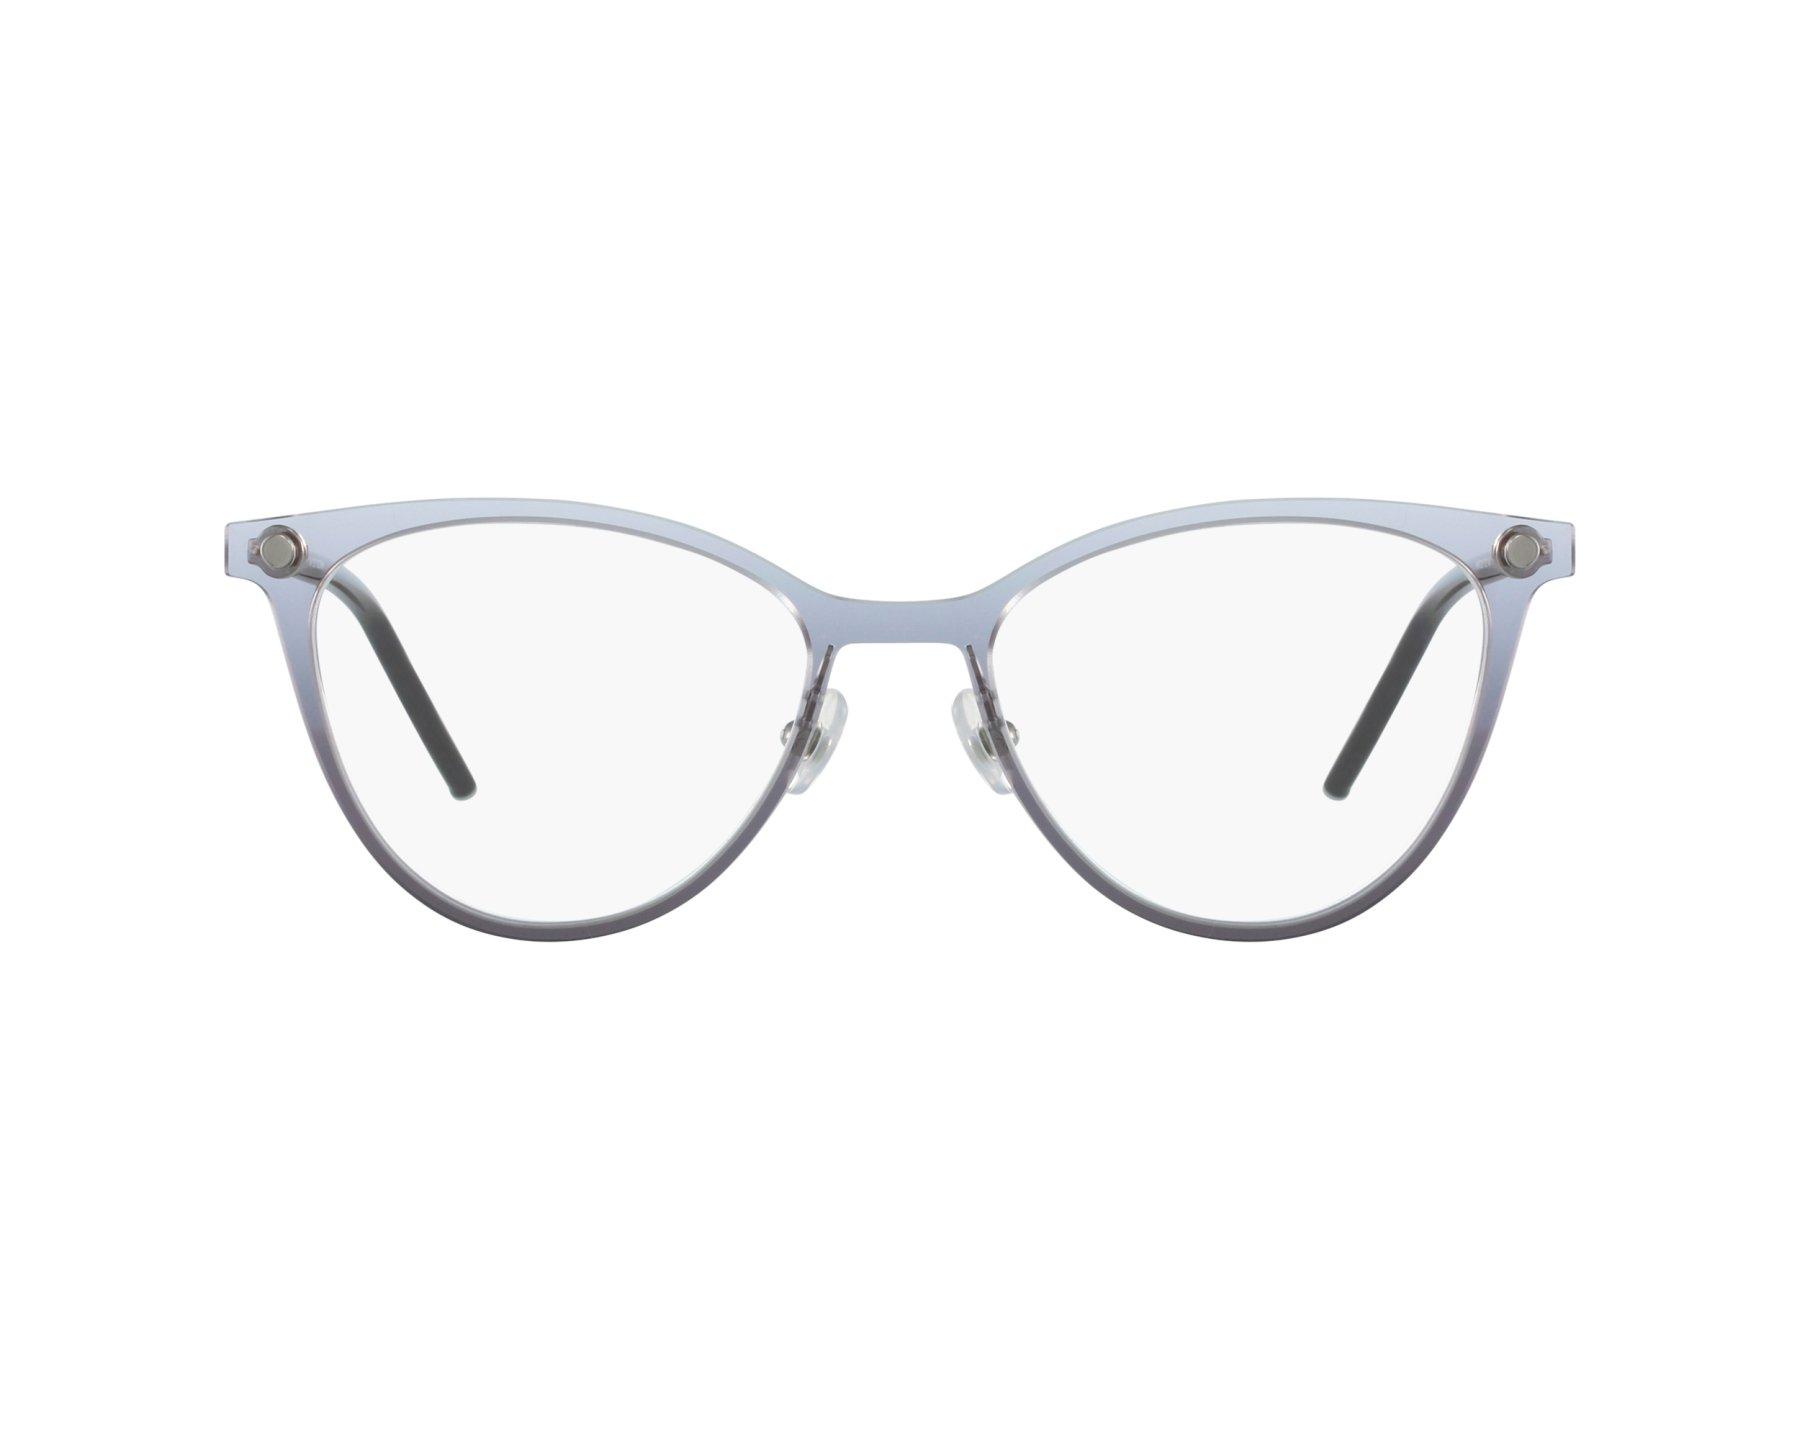 Marc Jacobs Brille MARC-32 732 grau - Gläser: